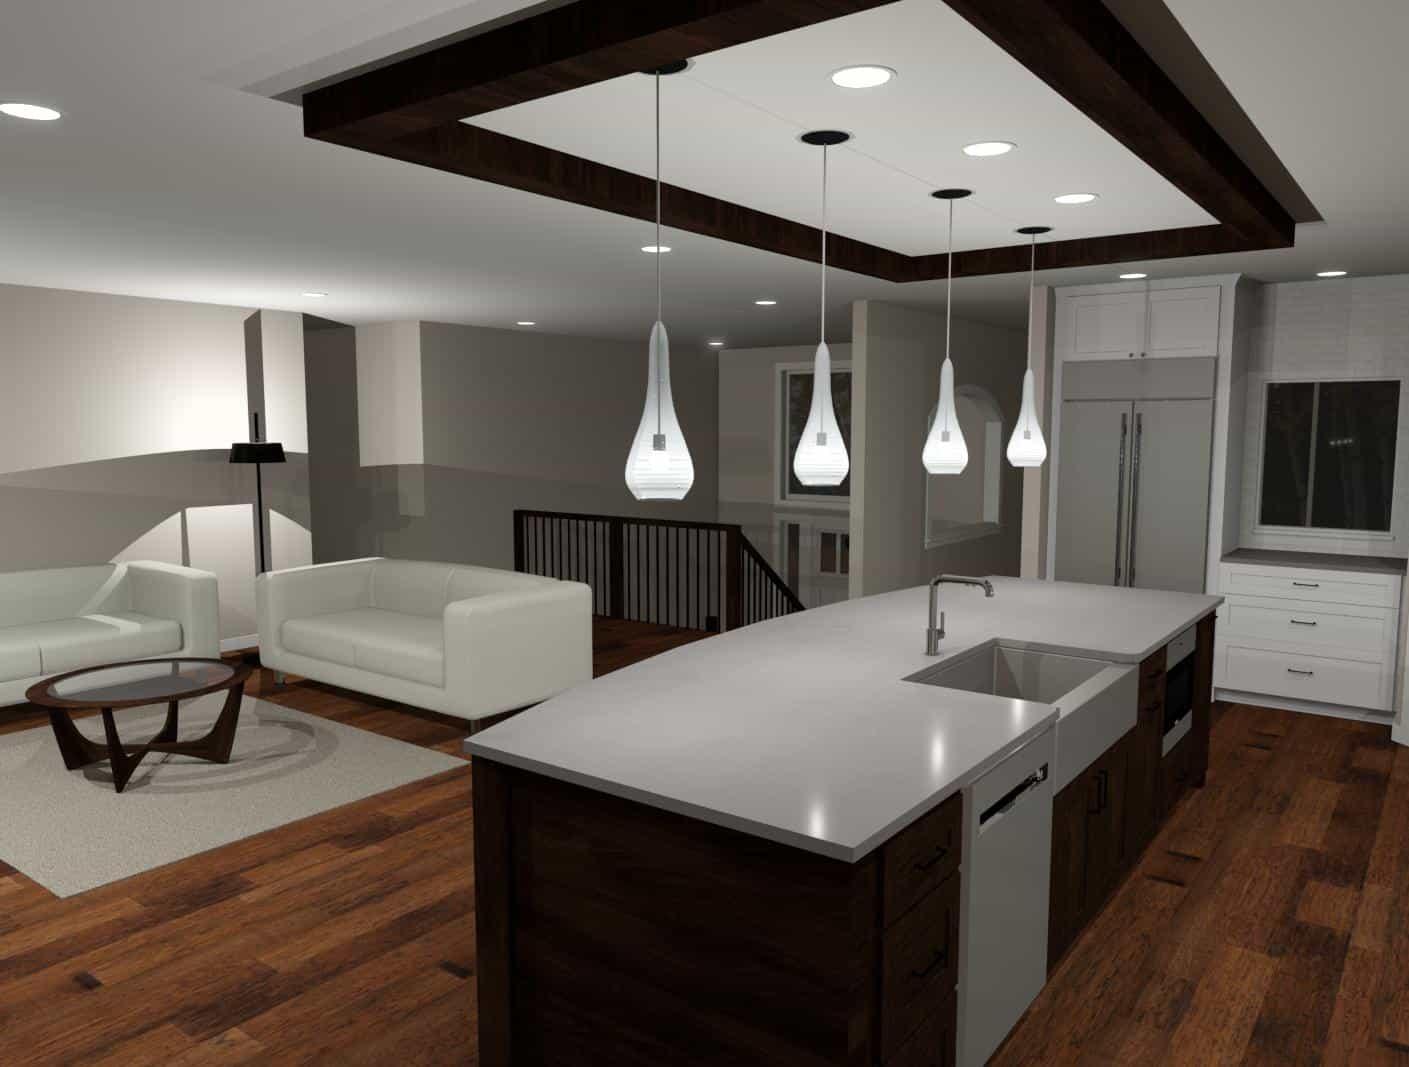 3D Model of a kitchen island - Designers Northwest